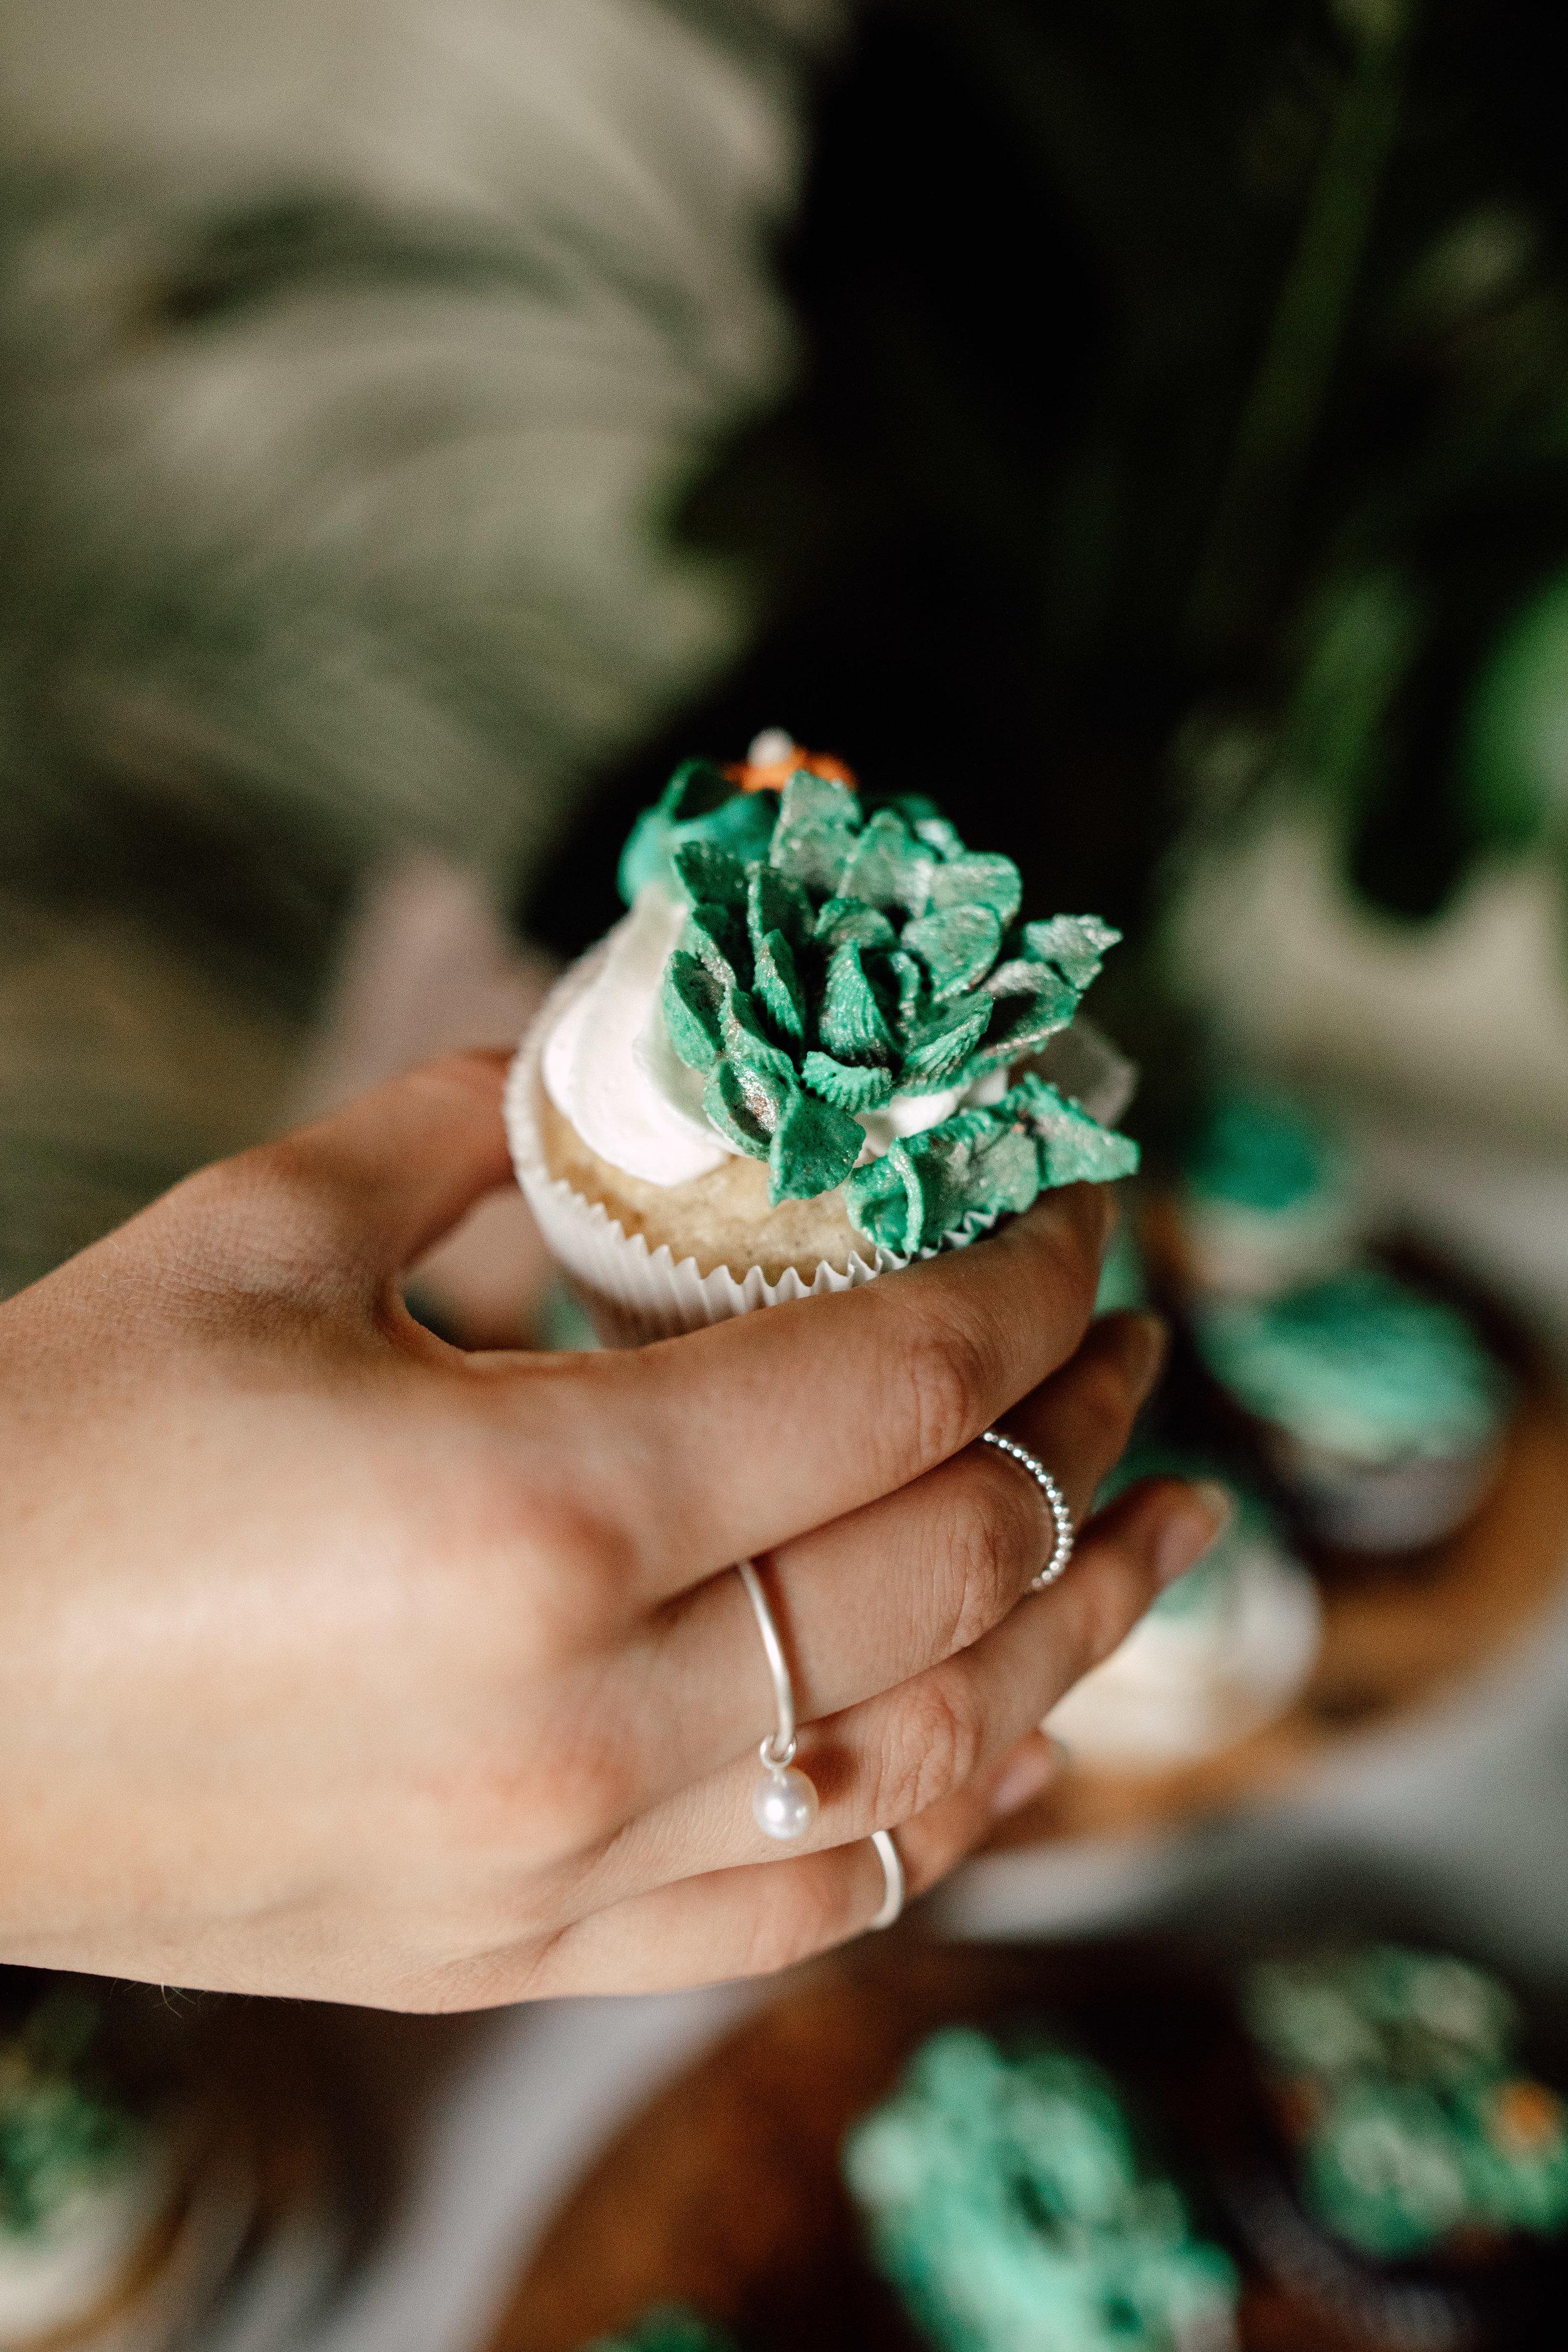 hamburg-greenery-the-saums-wedding-fashion-photography-17.jpg